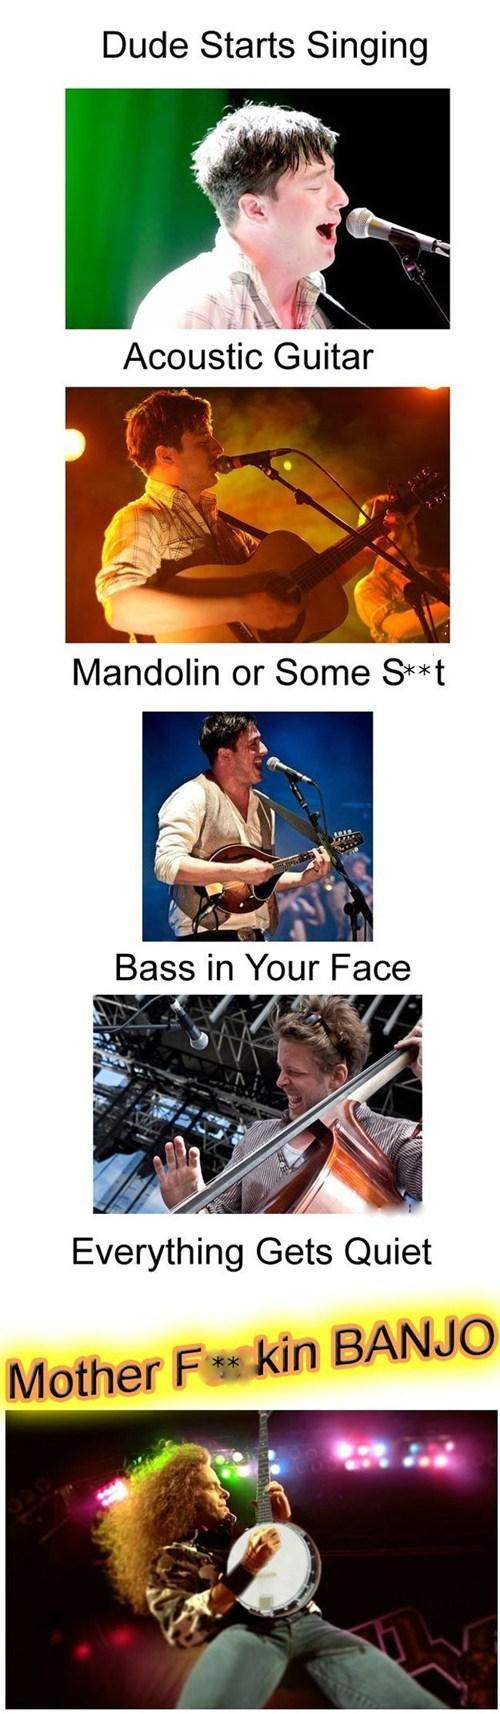 banjo,mumford and sons,formulas,Music FAILS